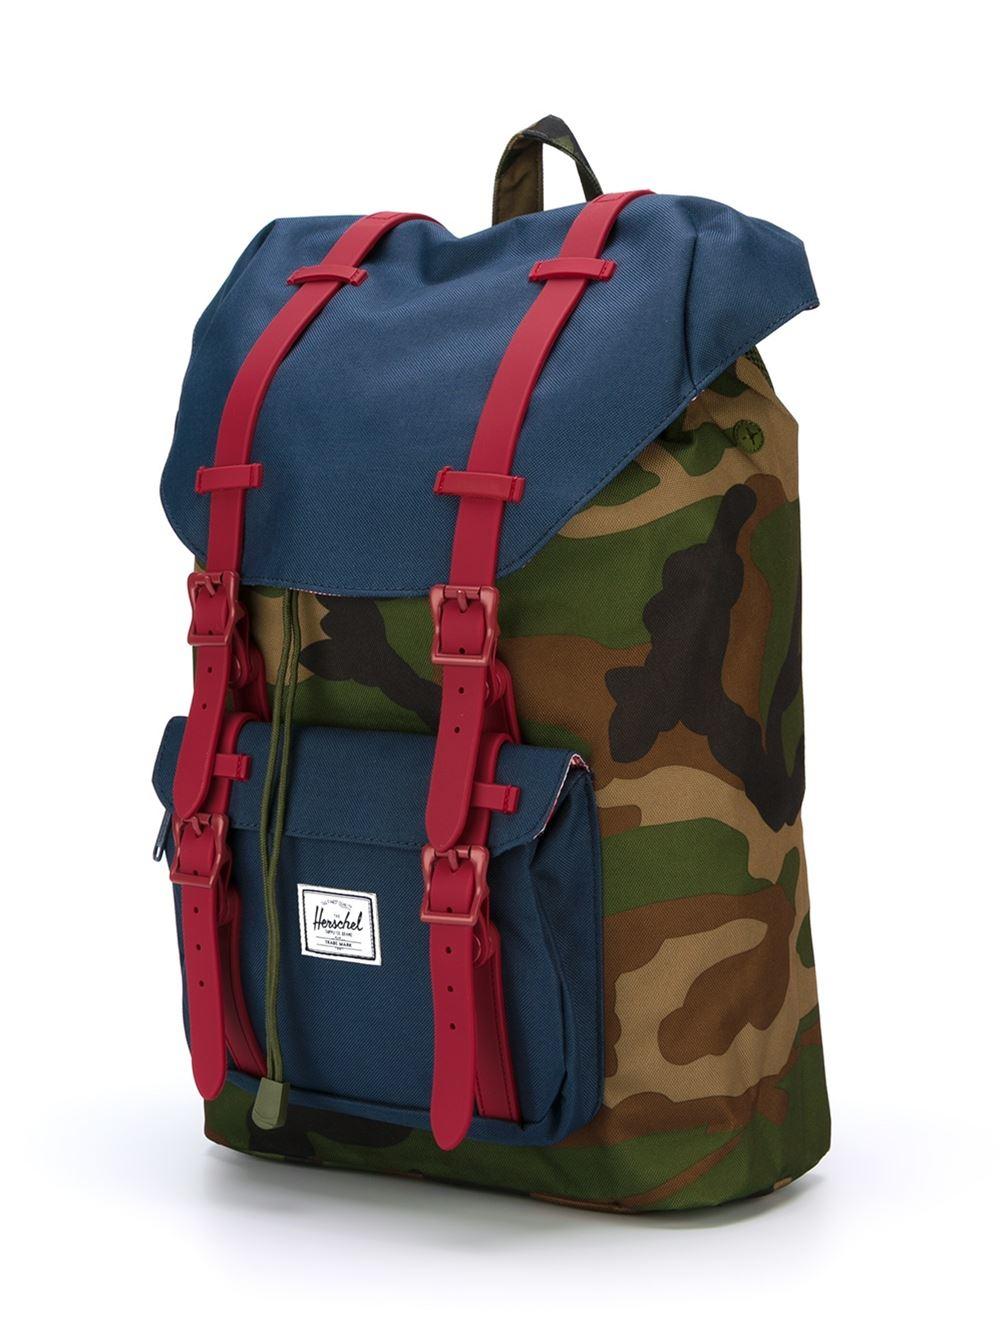 herschel supply co camouflage print backpack in green for men lyst. Black Bedroom Furniture Sets. Home Design Ideas